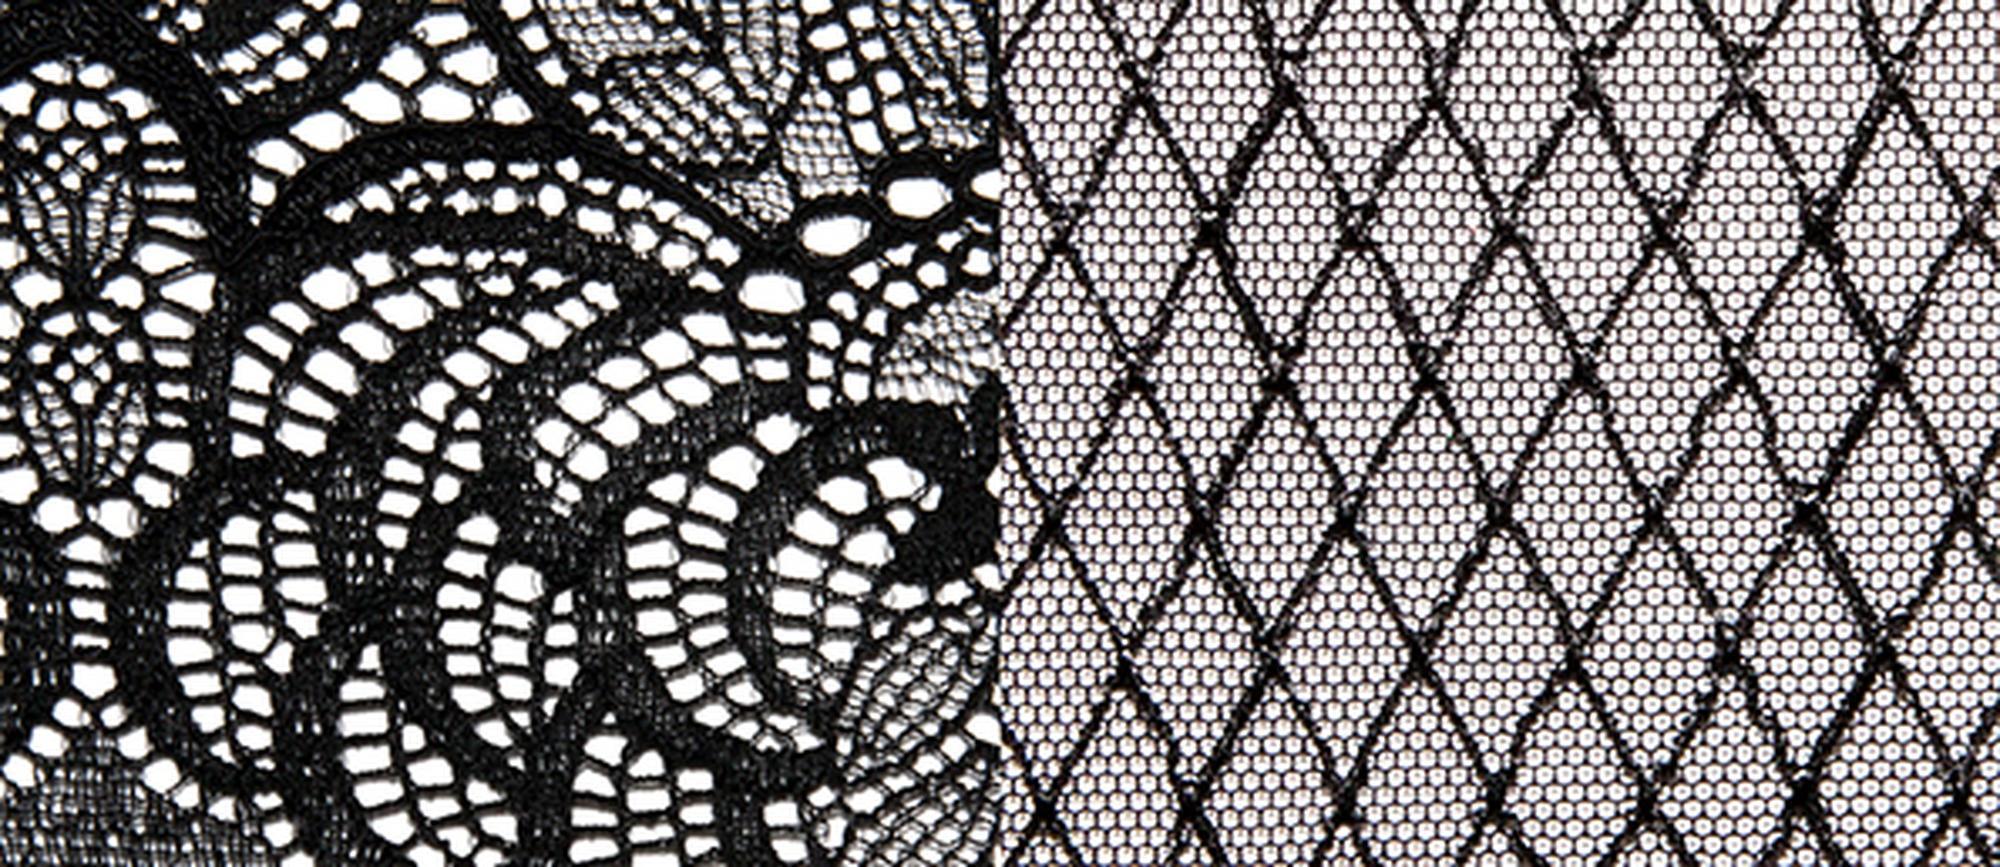 mj-linda-zwart-2000-0-72-rgb.jpg